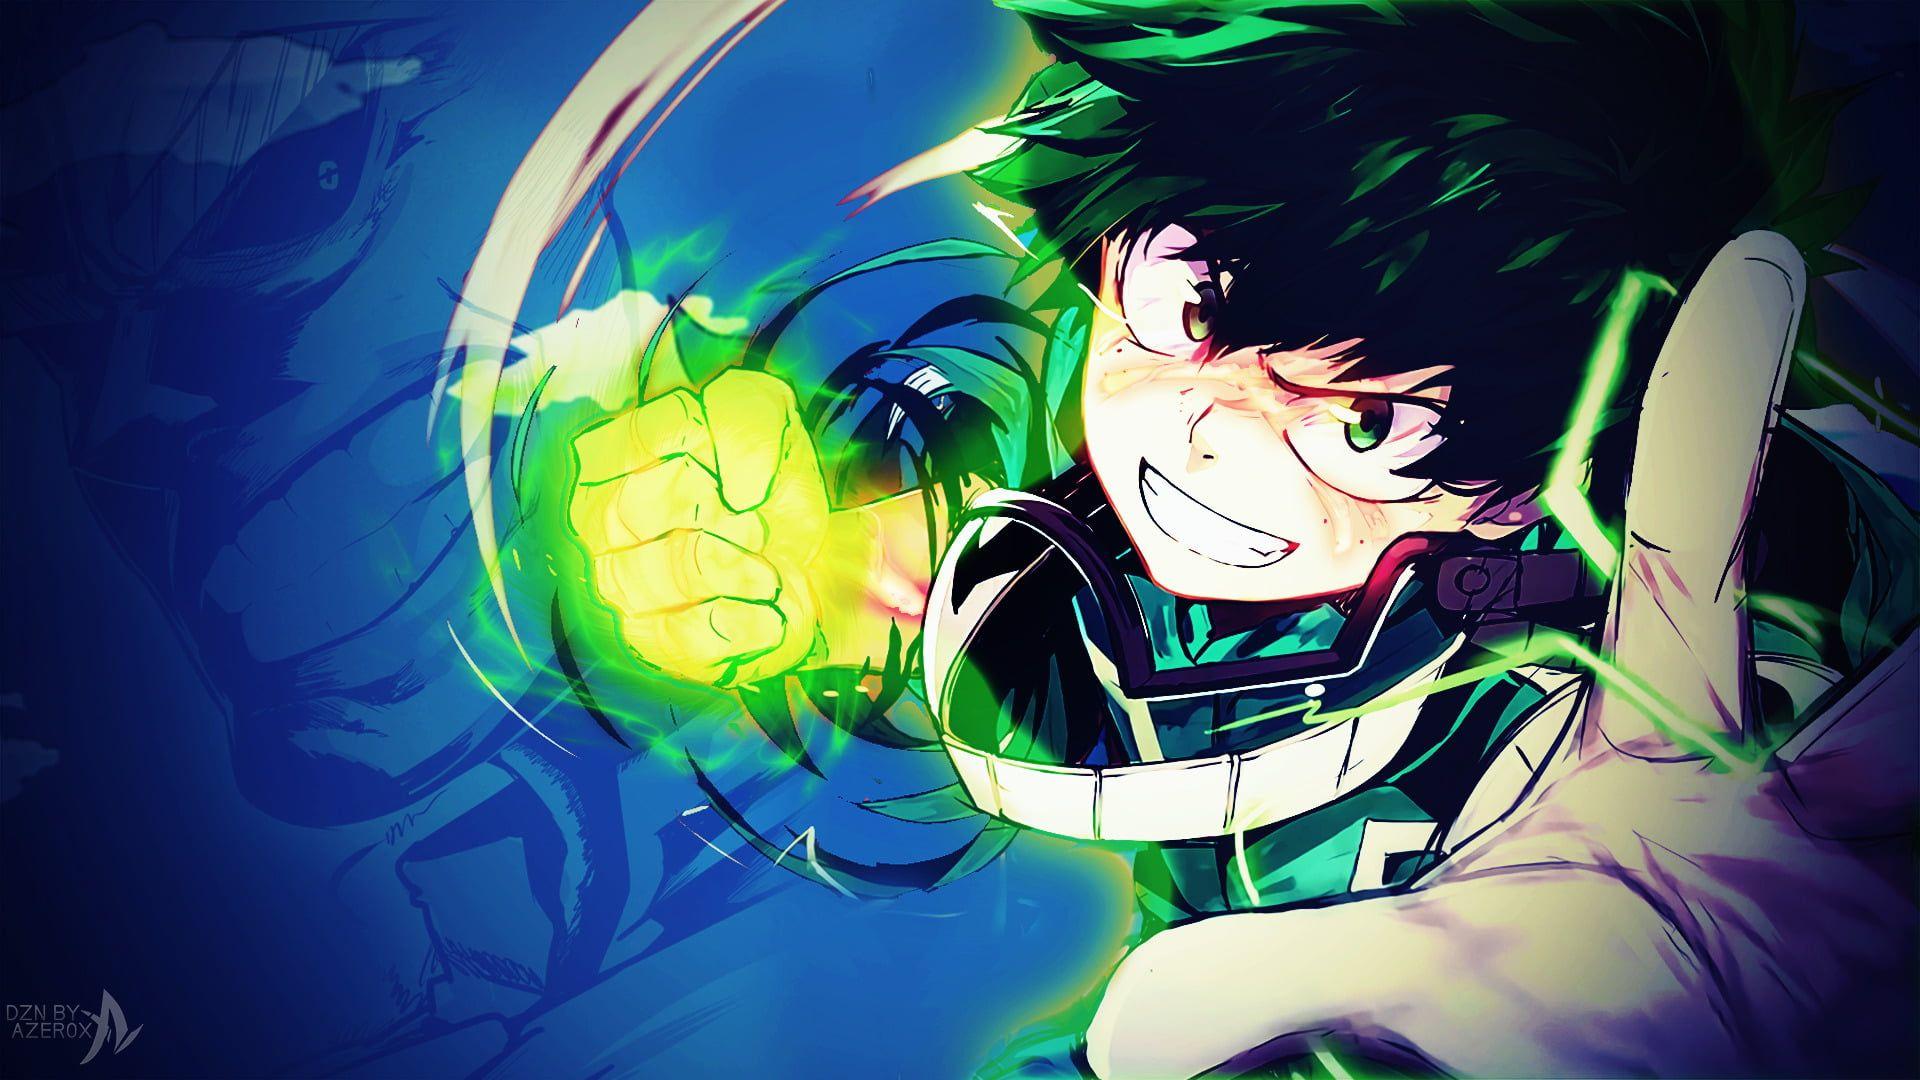 Deku My Hero Academia Anime My Hero Academia Boku No Hero Academia Glove Glow Green Eyes Green Hair Izuku Anime Wallpaper Anime Background Images Wallpapers